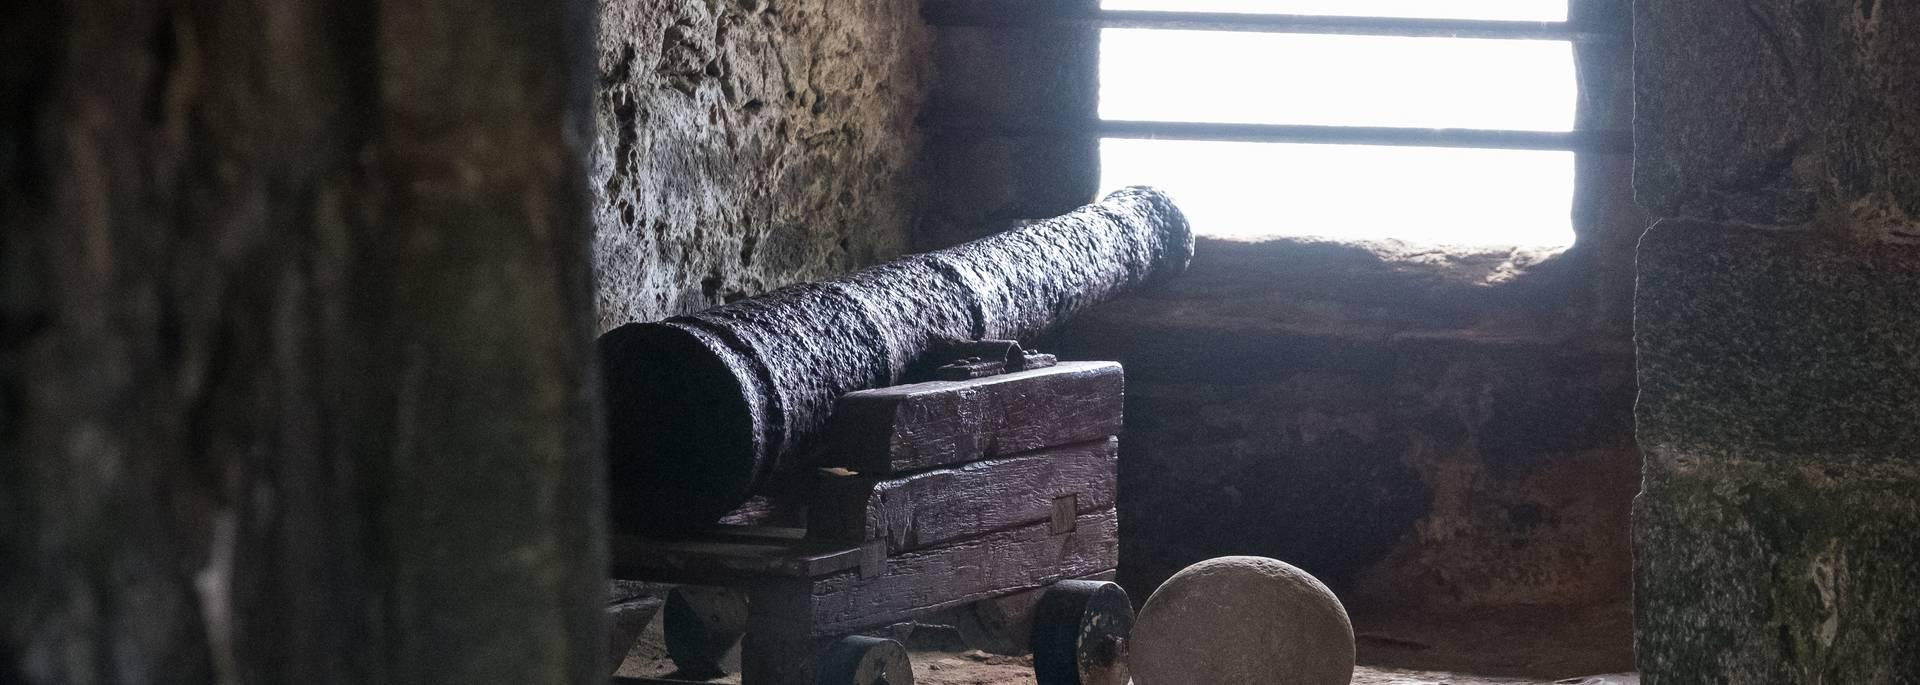 Die Alte Festung, Ile d'Yeu © S. Patrimoine / OT île d'Yeu